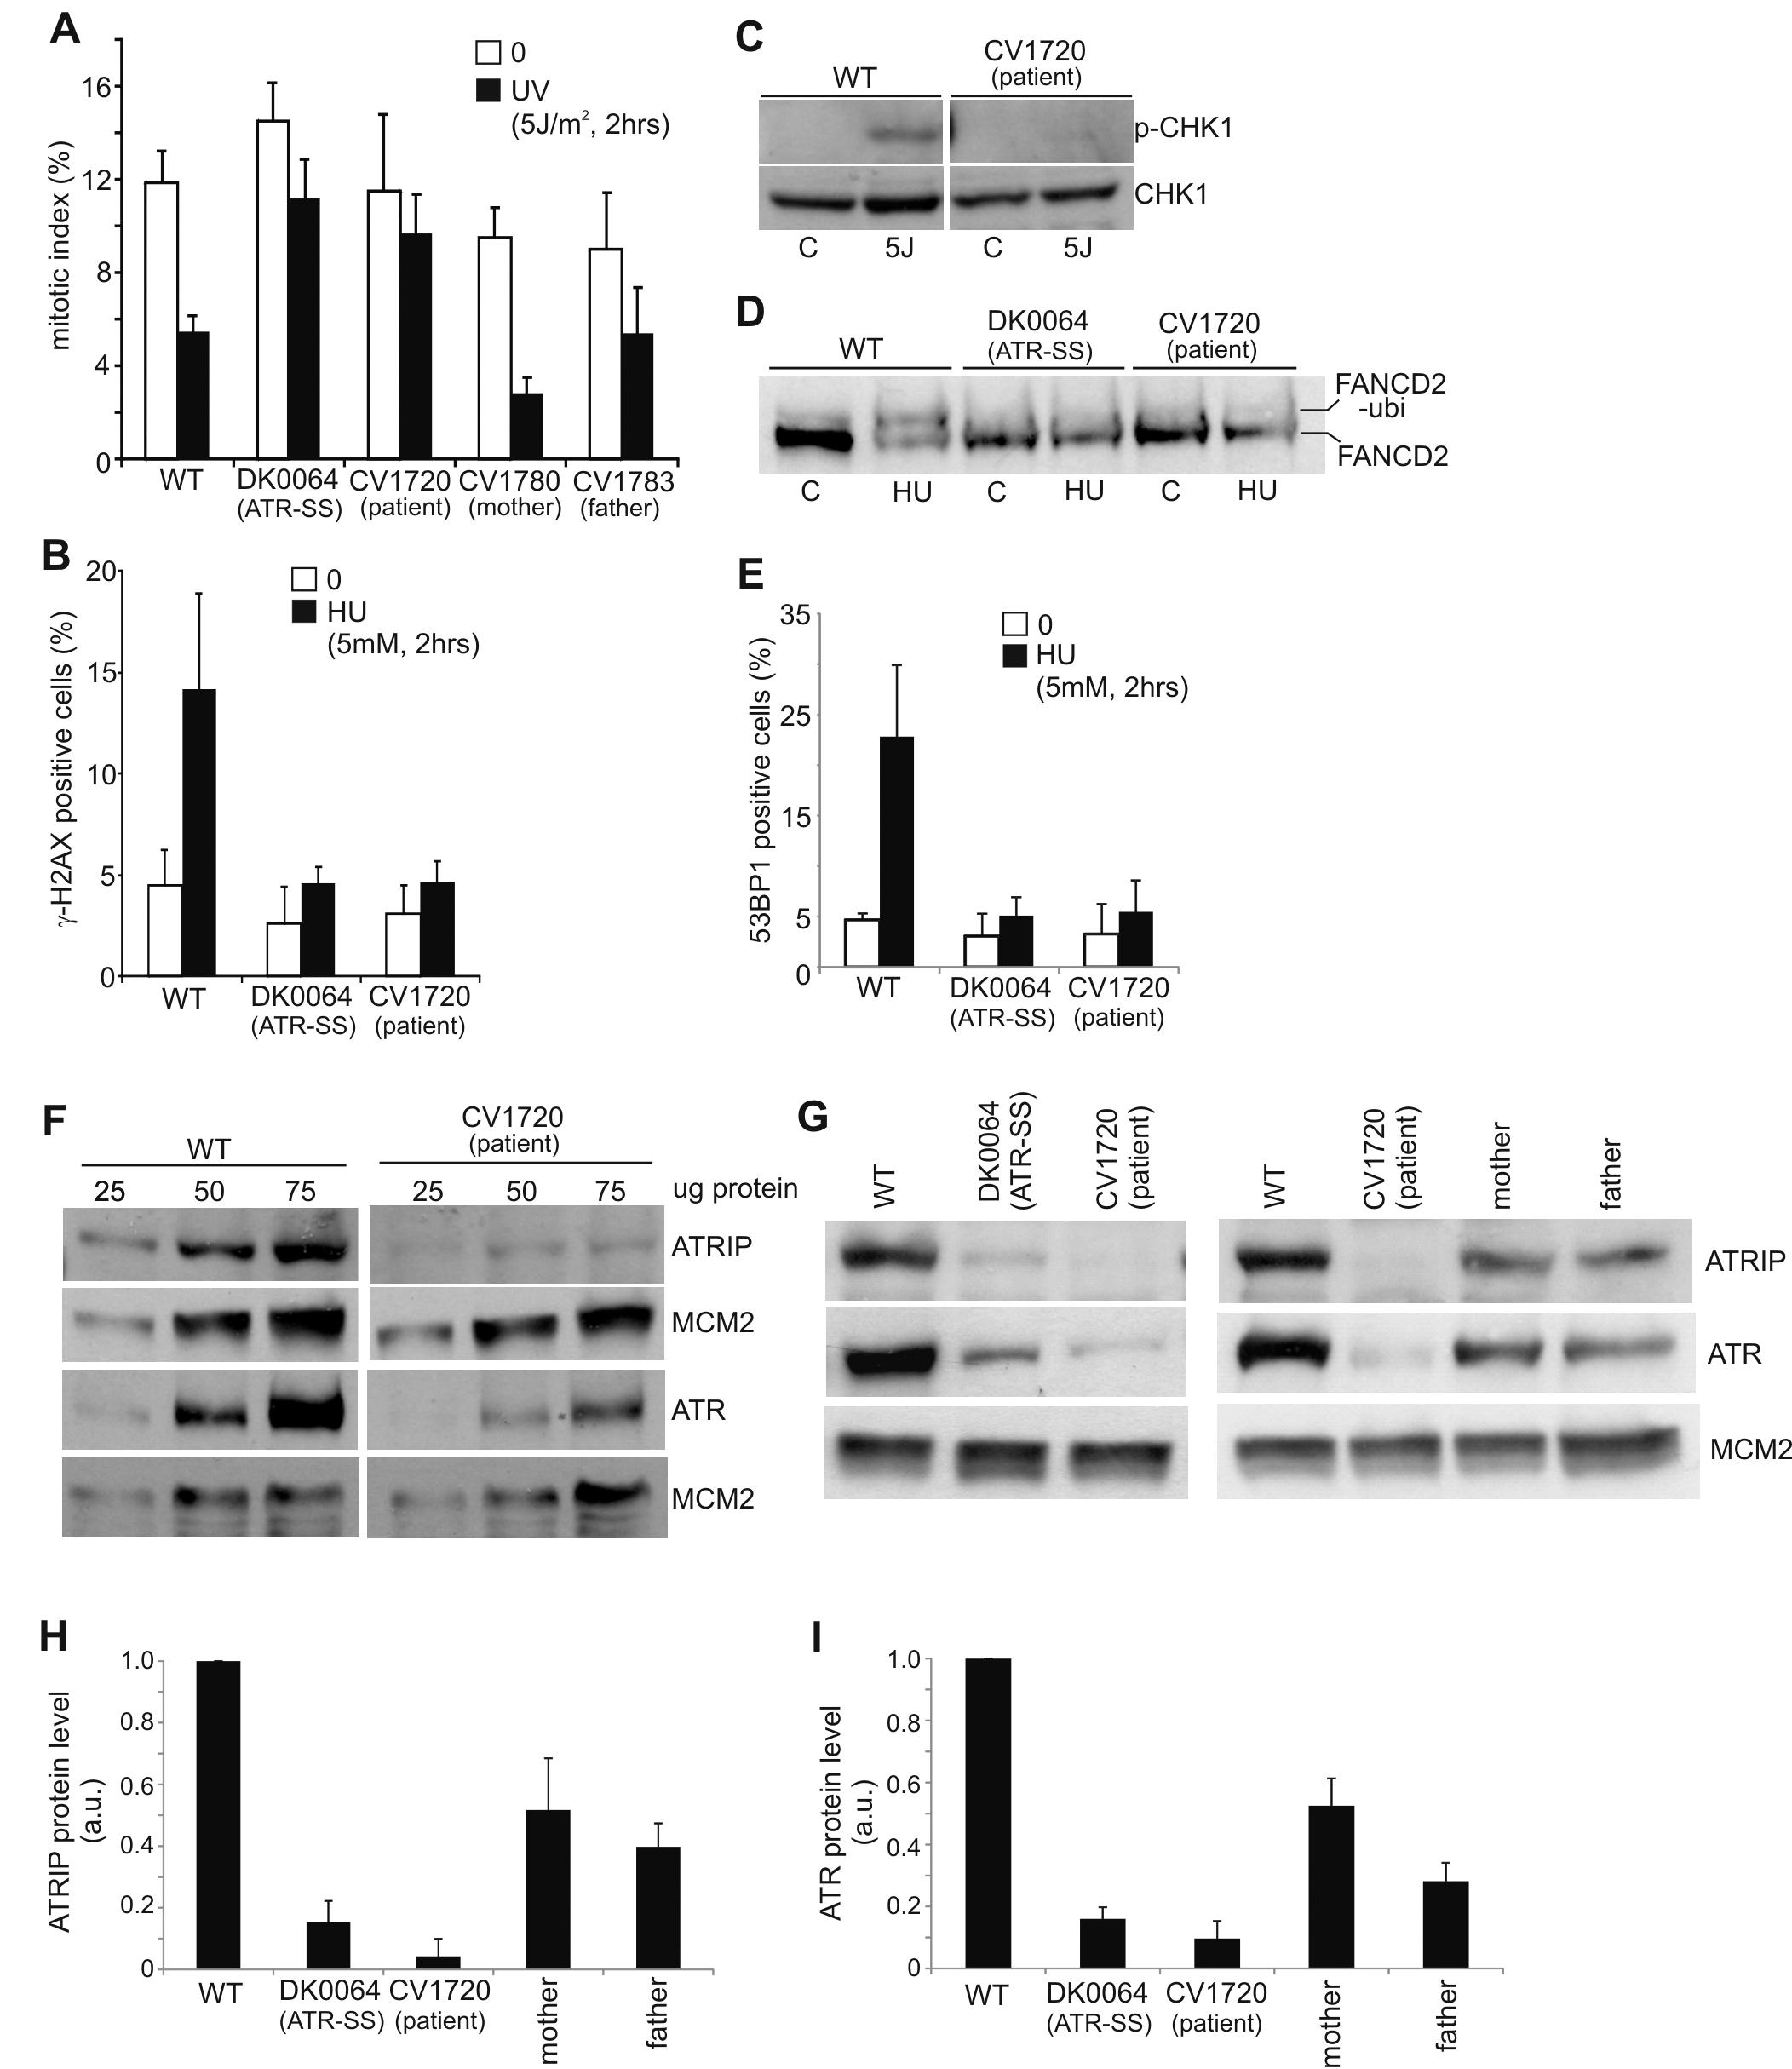 CV1720 cells show impaired ATR–dependent DNA damage responses.